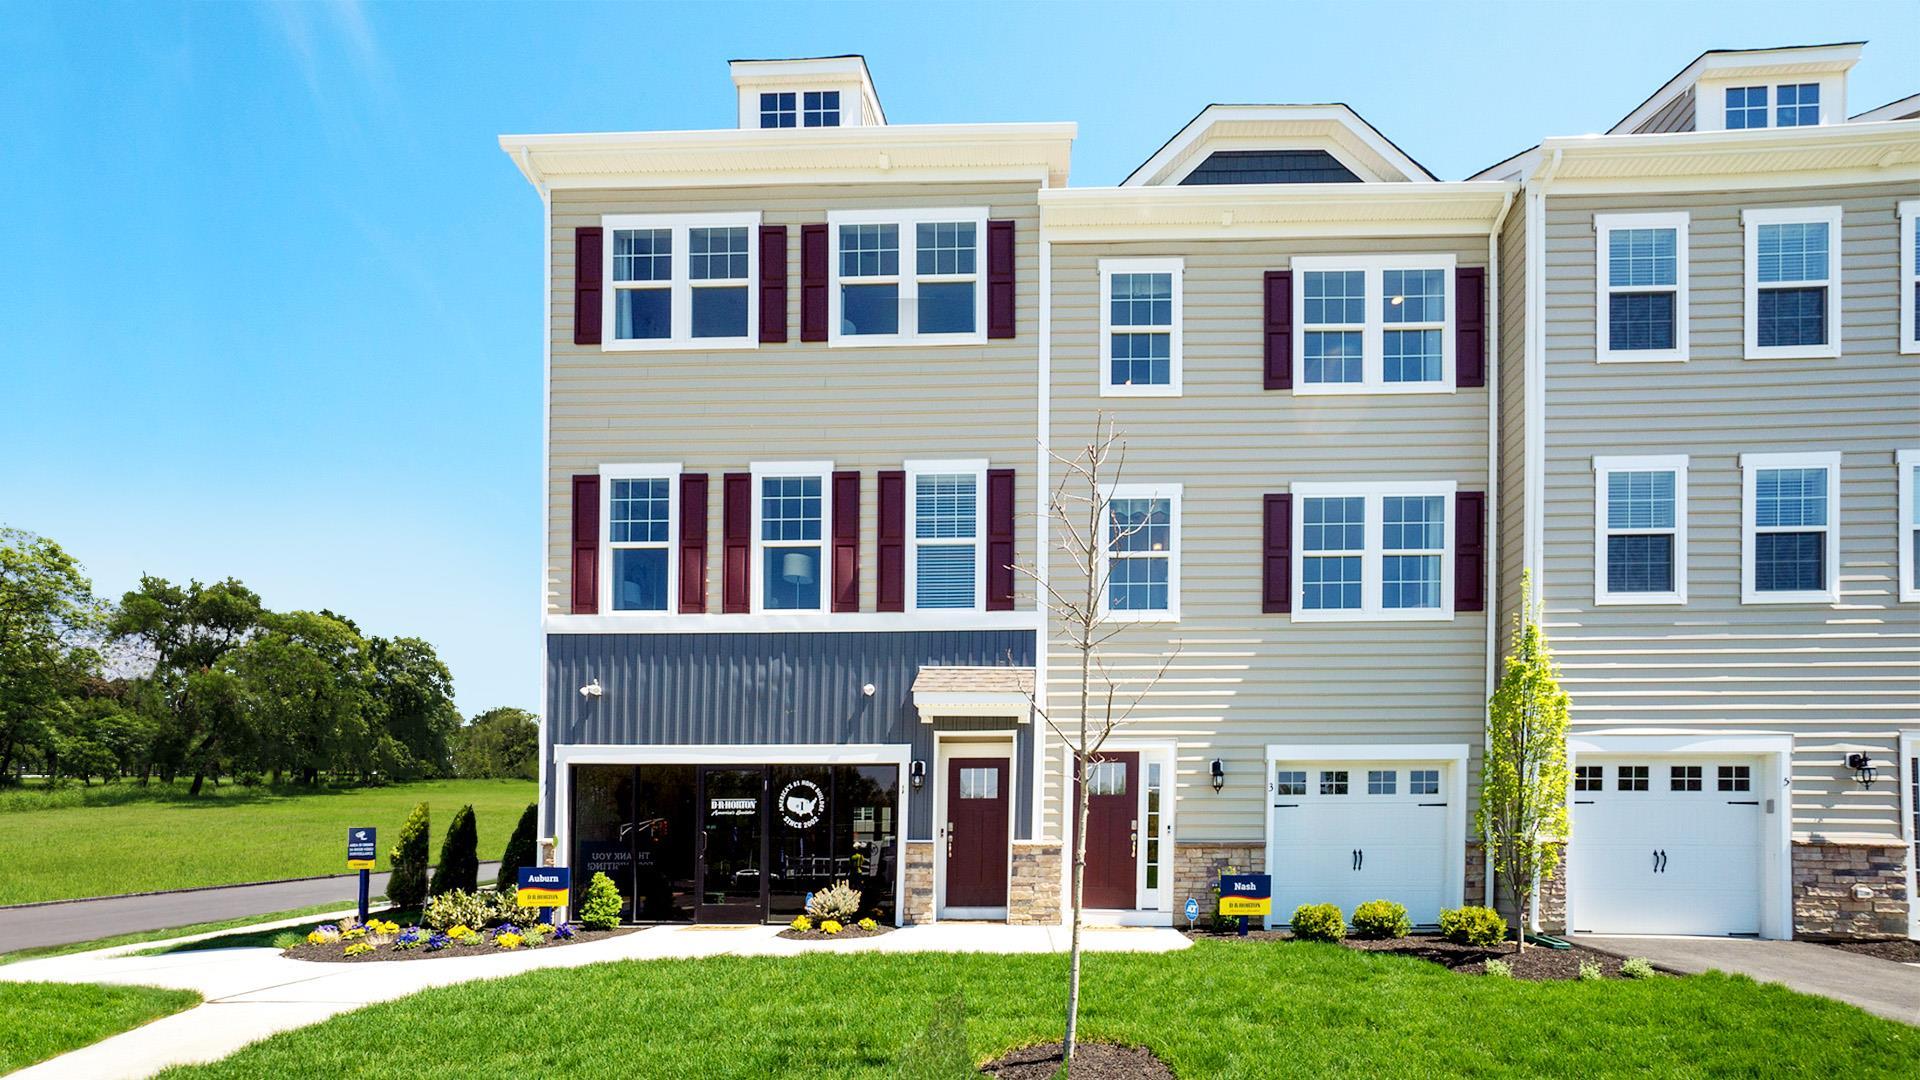 Wondrous Signature Place In Mount Laurel Township Nj Prices Plans Download Free Architecture Designs Intelgarnamadebymaigaardcom